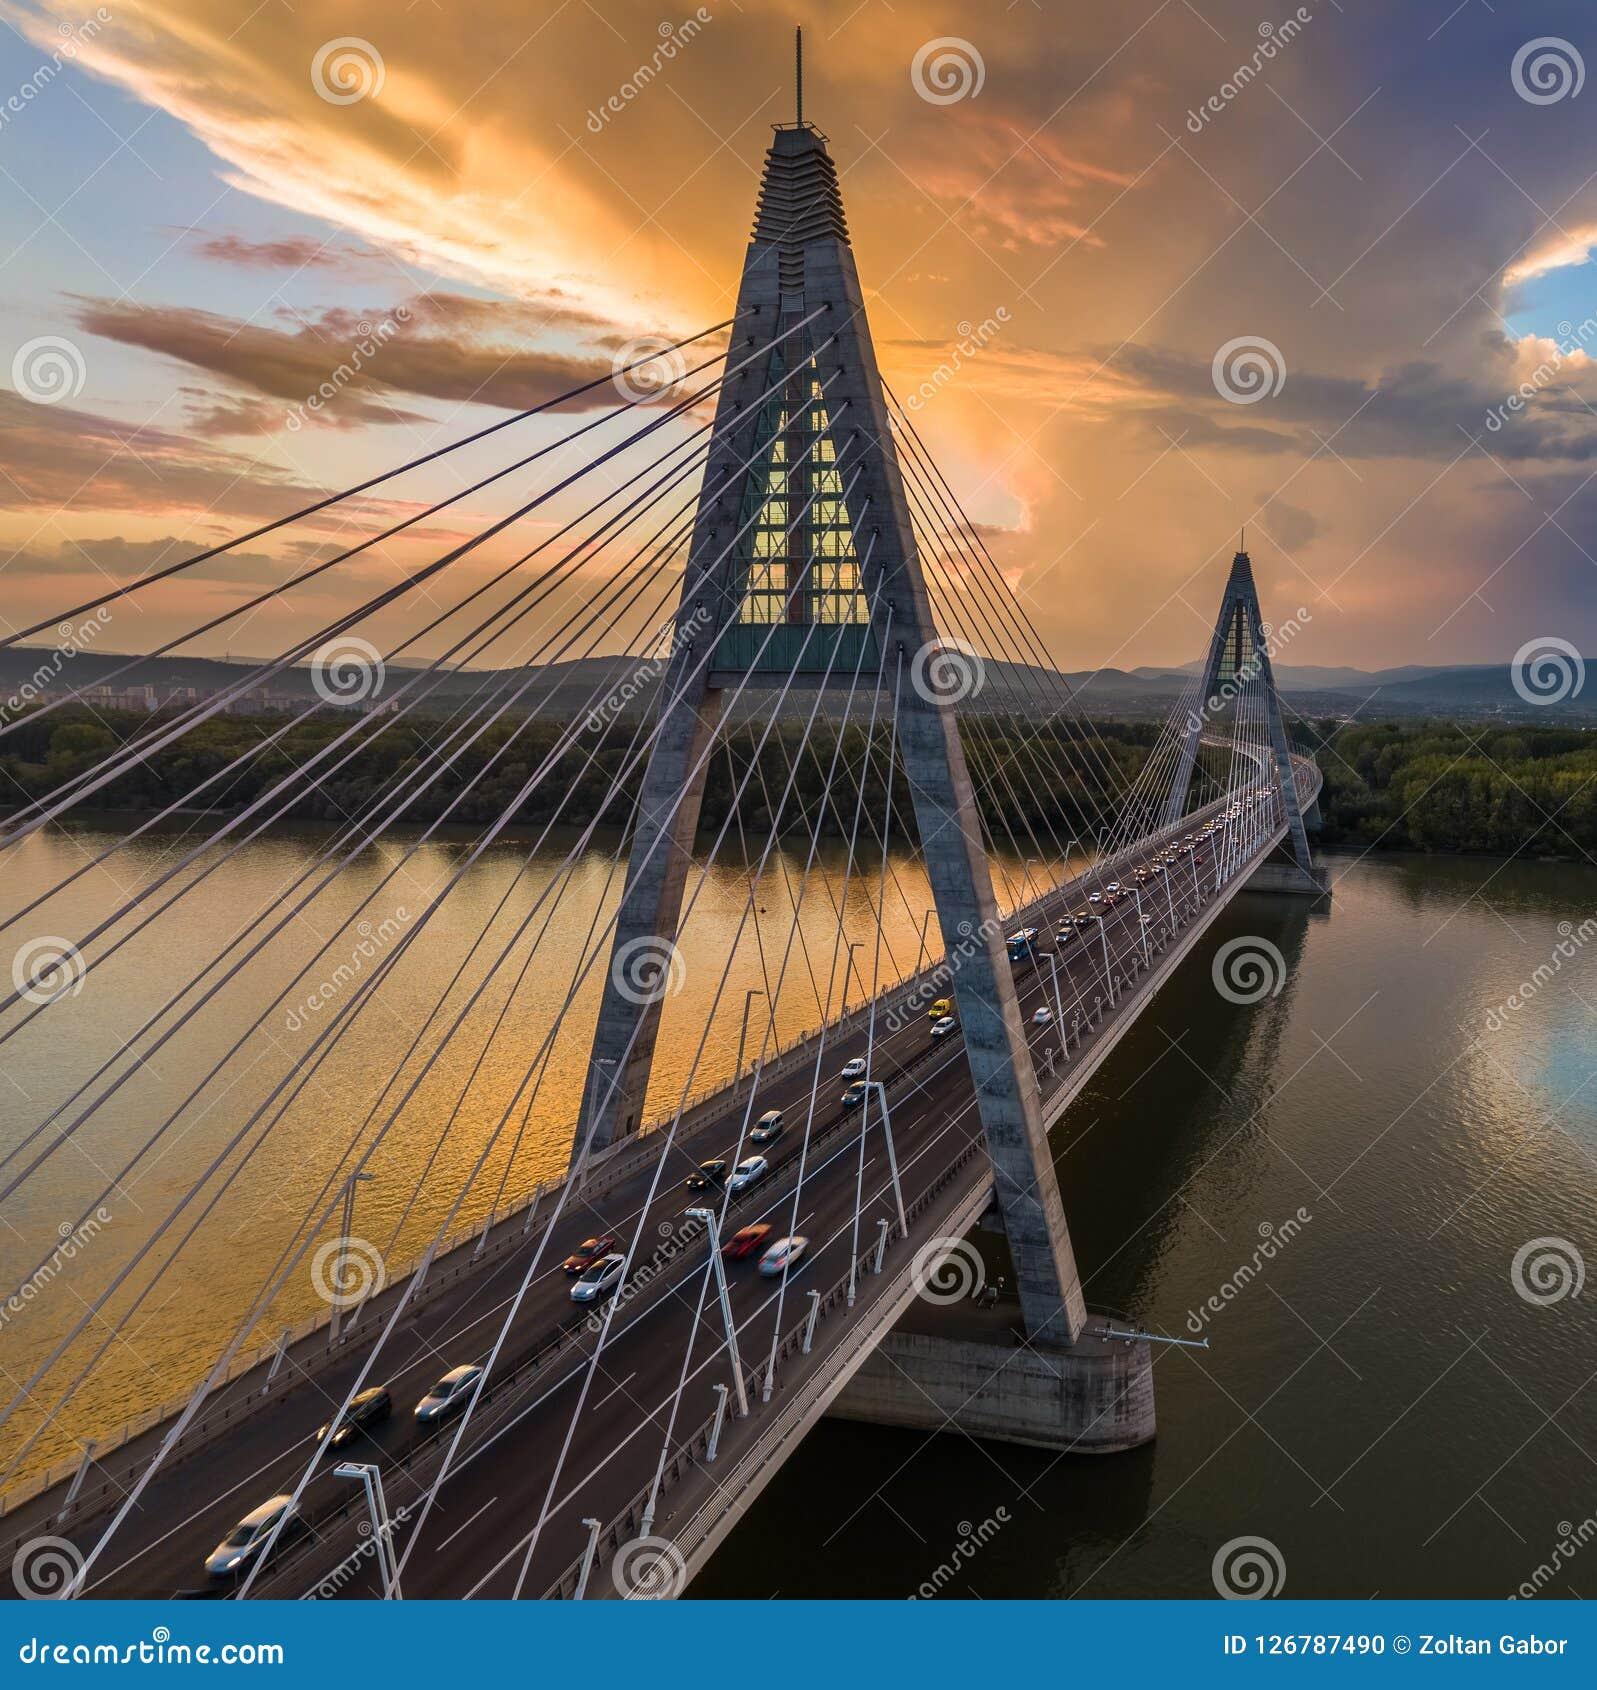 Budapest, Hungary - Megyeri Bridge over River Danube at sunset with heavy traffic, beautiful dramatic clouds